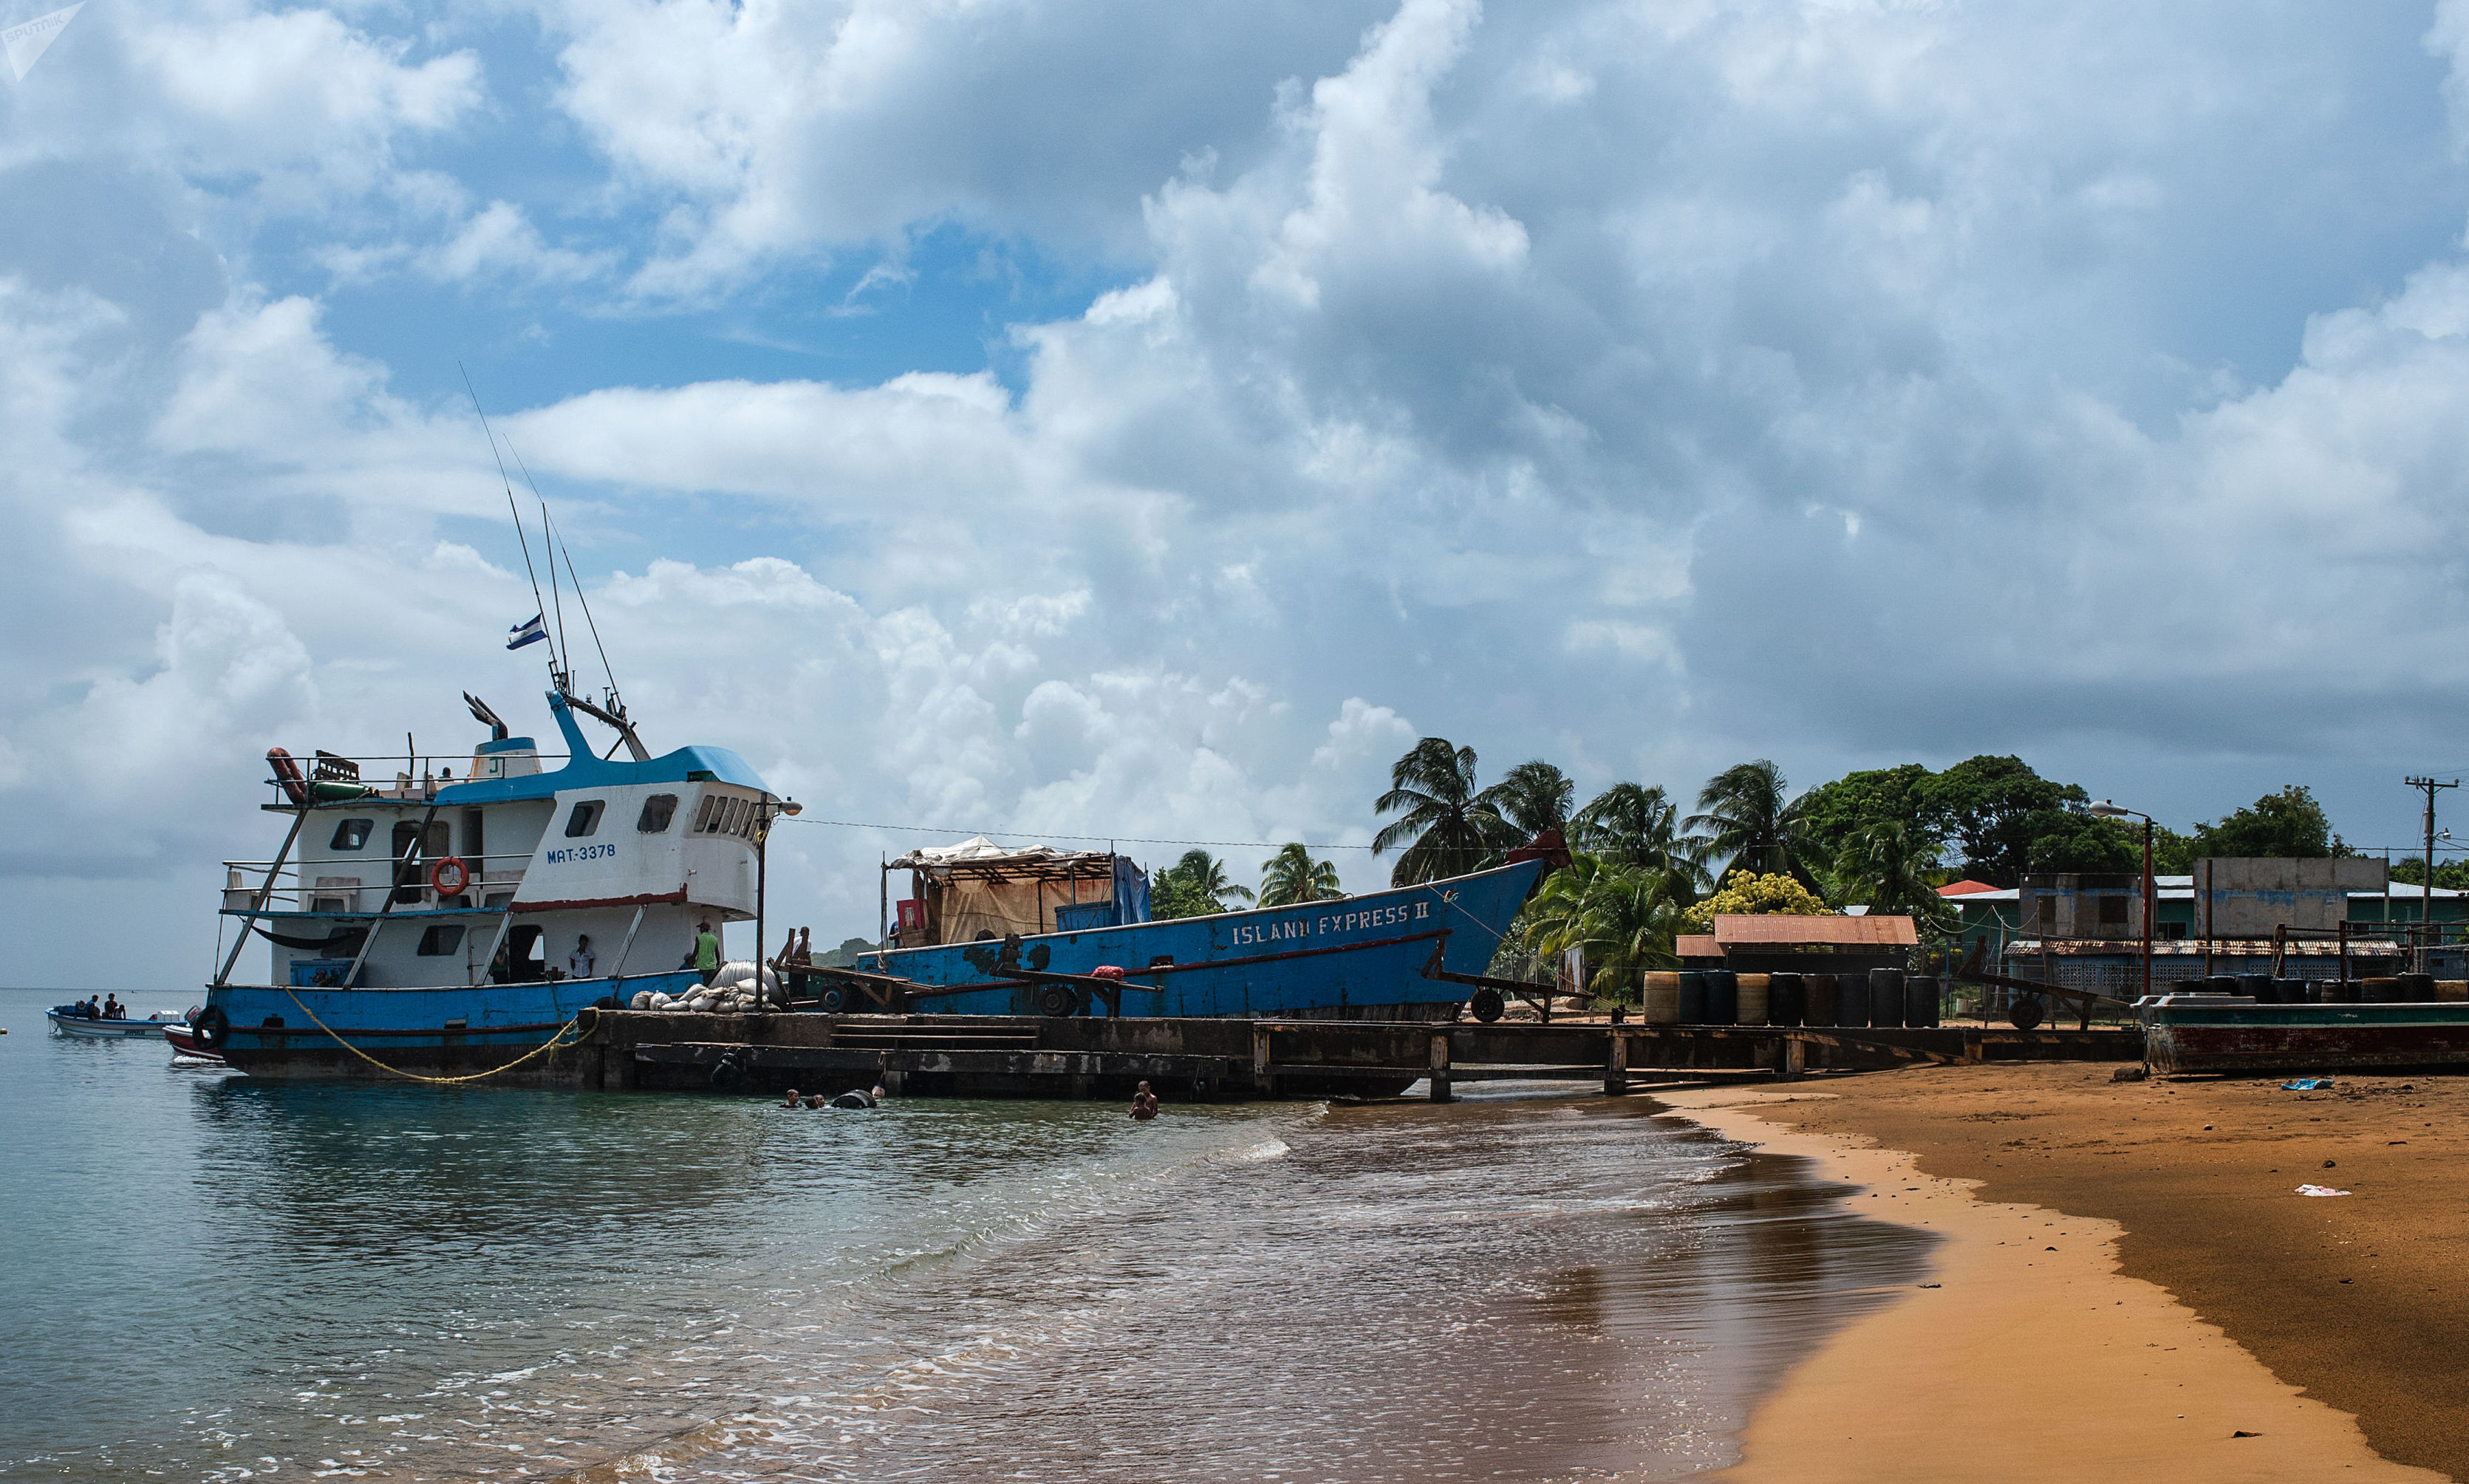 Un barco pescadero cerca de Big Corn Island